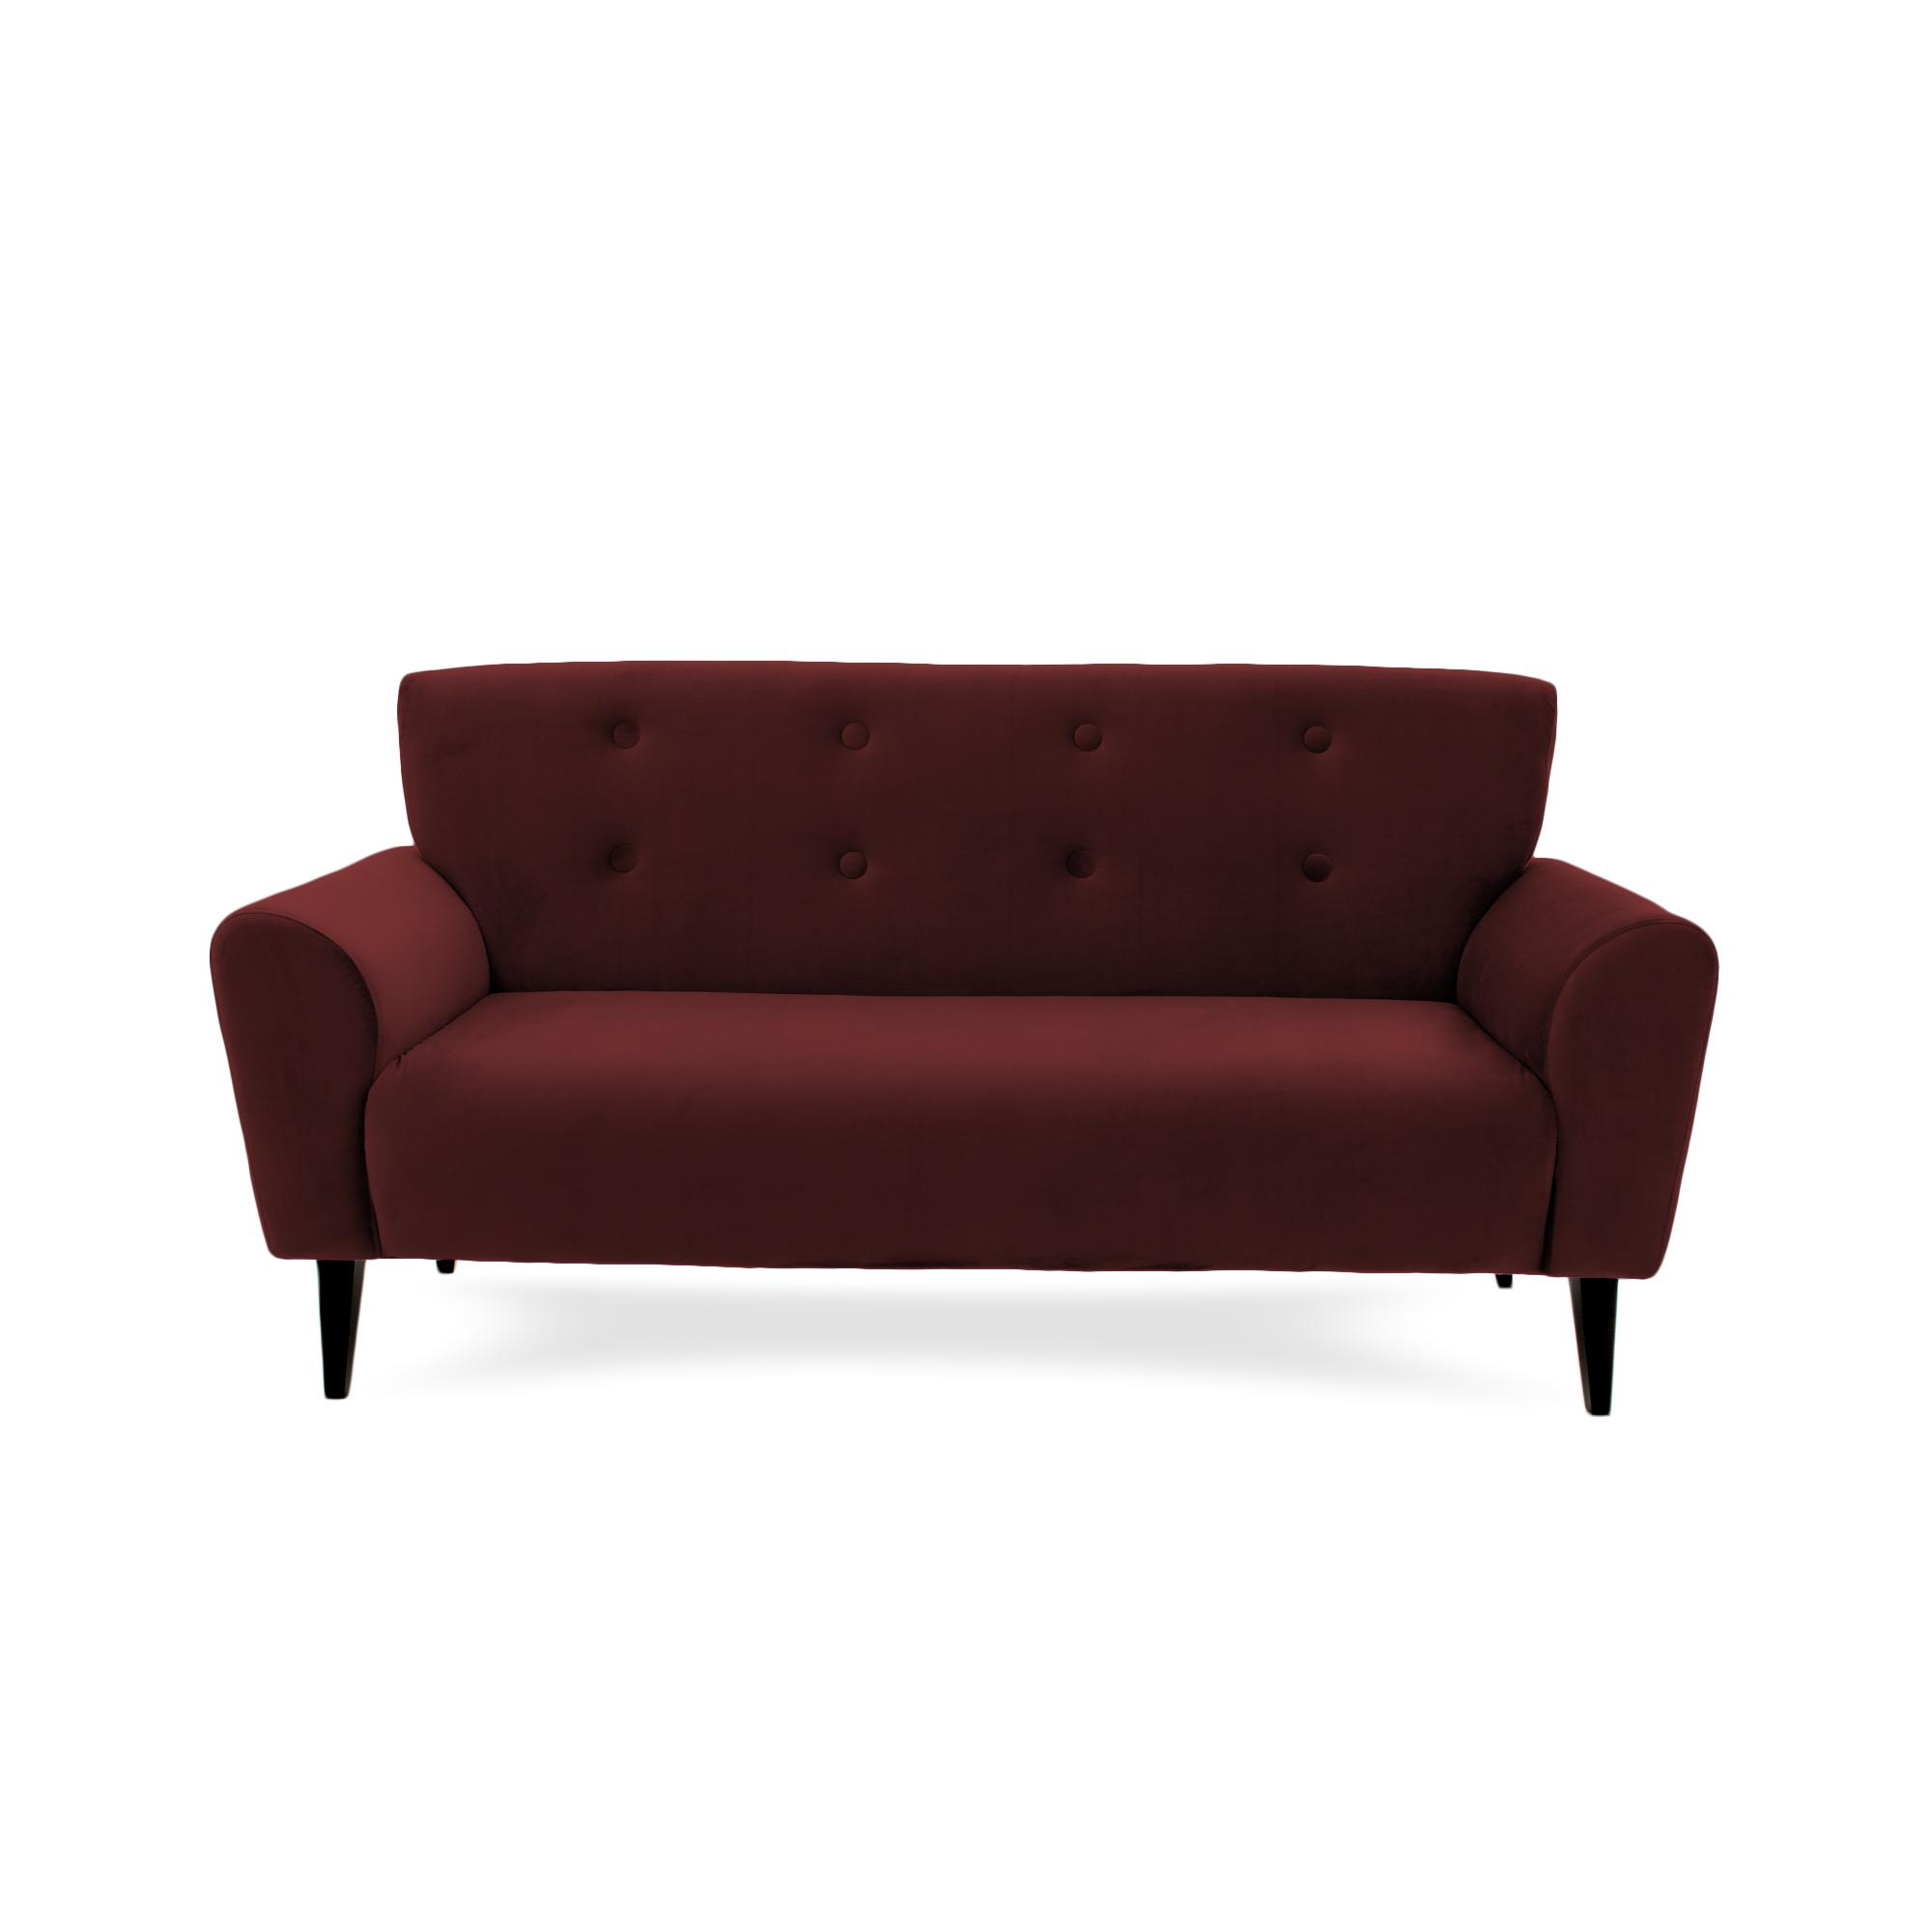 Canapea Fixa 3 locuri Kiara Burgundy Red